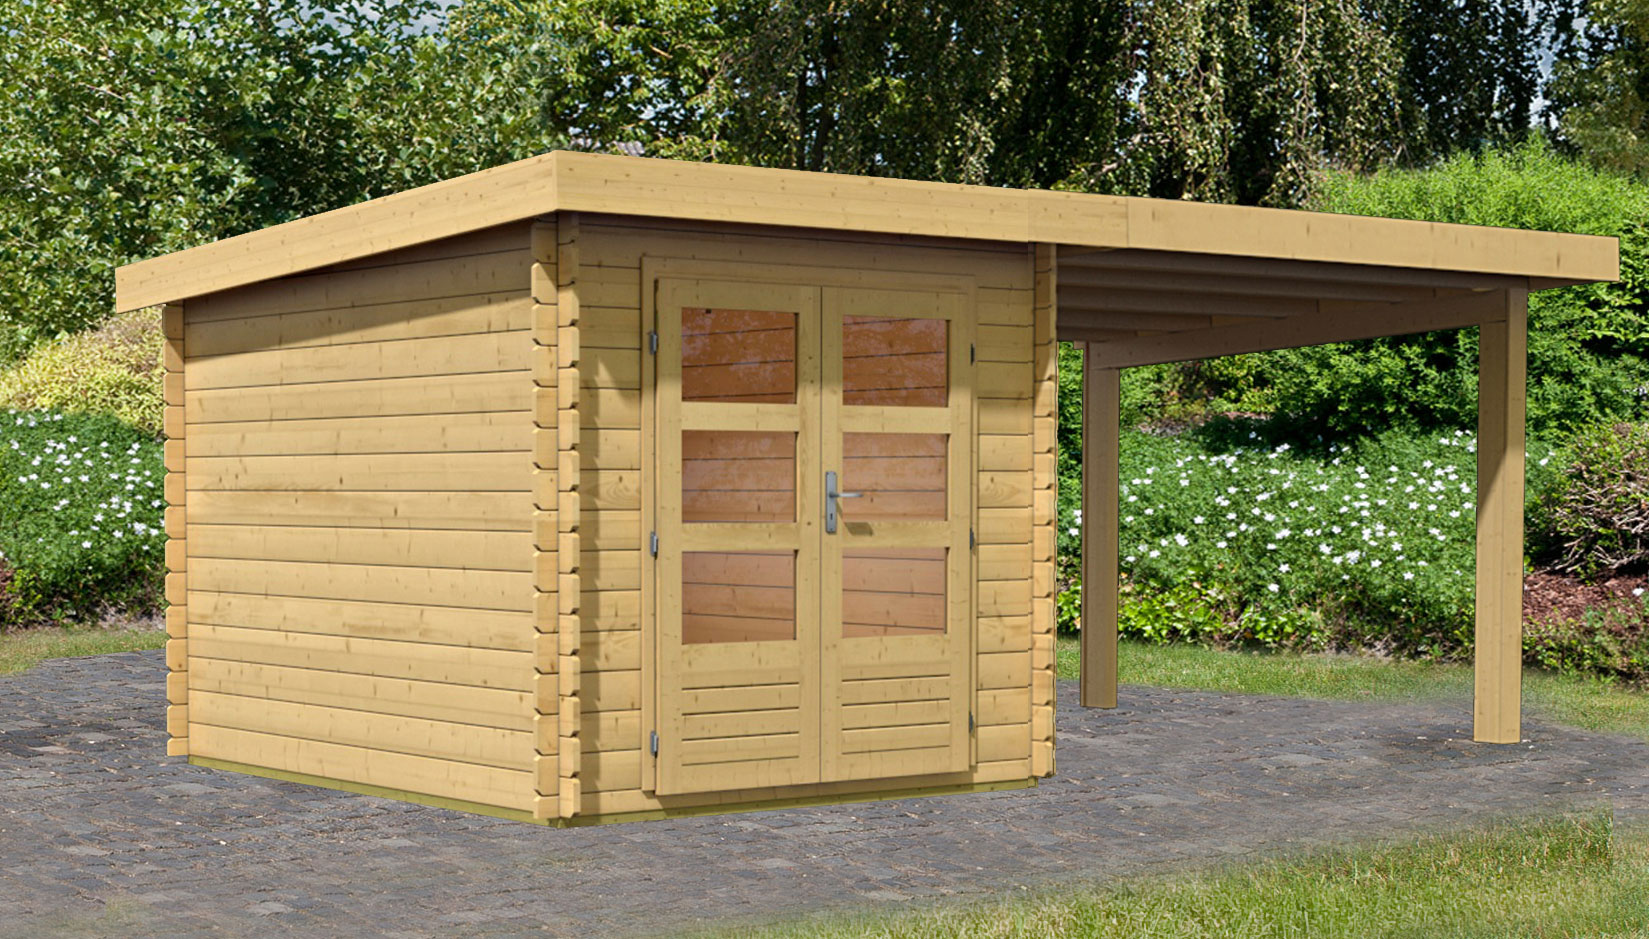 woodfeeling gartenhaus 28 mm bastrup 4 natur set 1 554x333cm bei. Black Bedroom Furniture Sets. Home Design Ideas